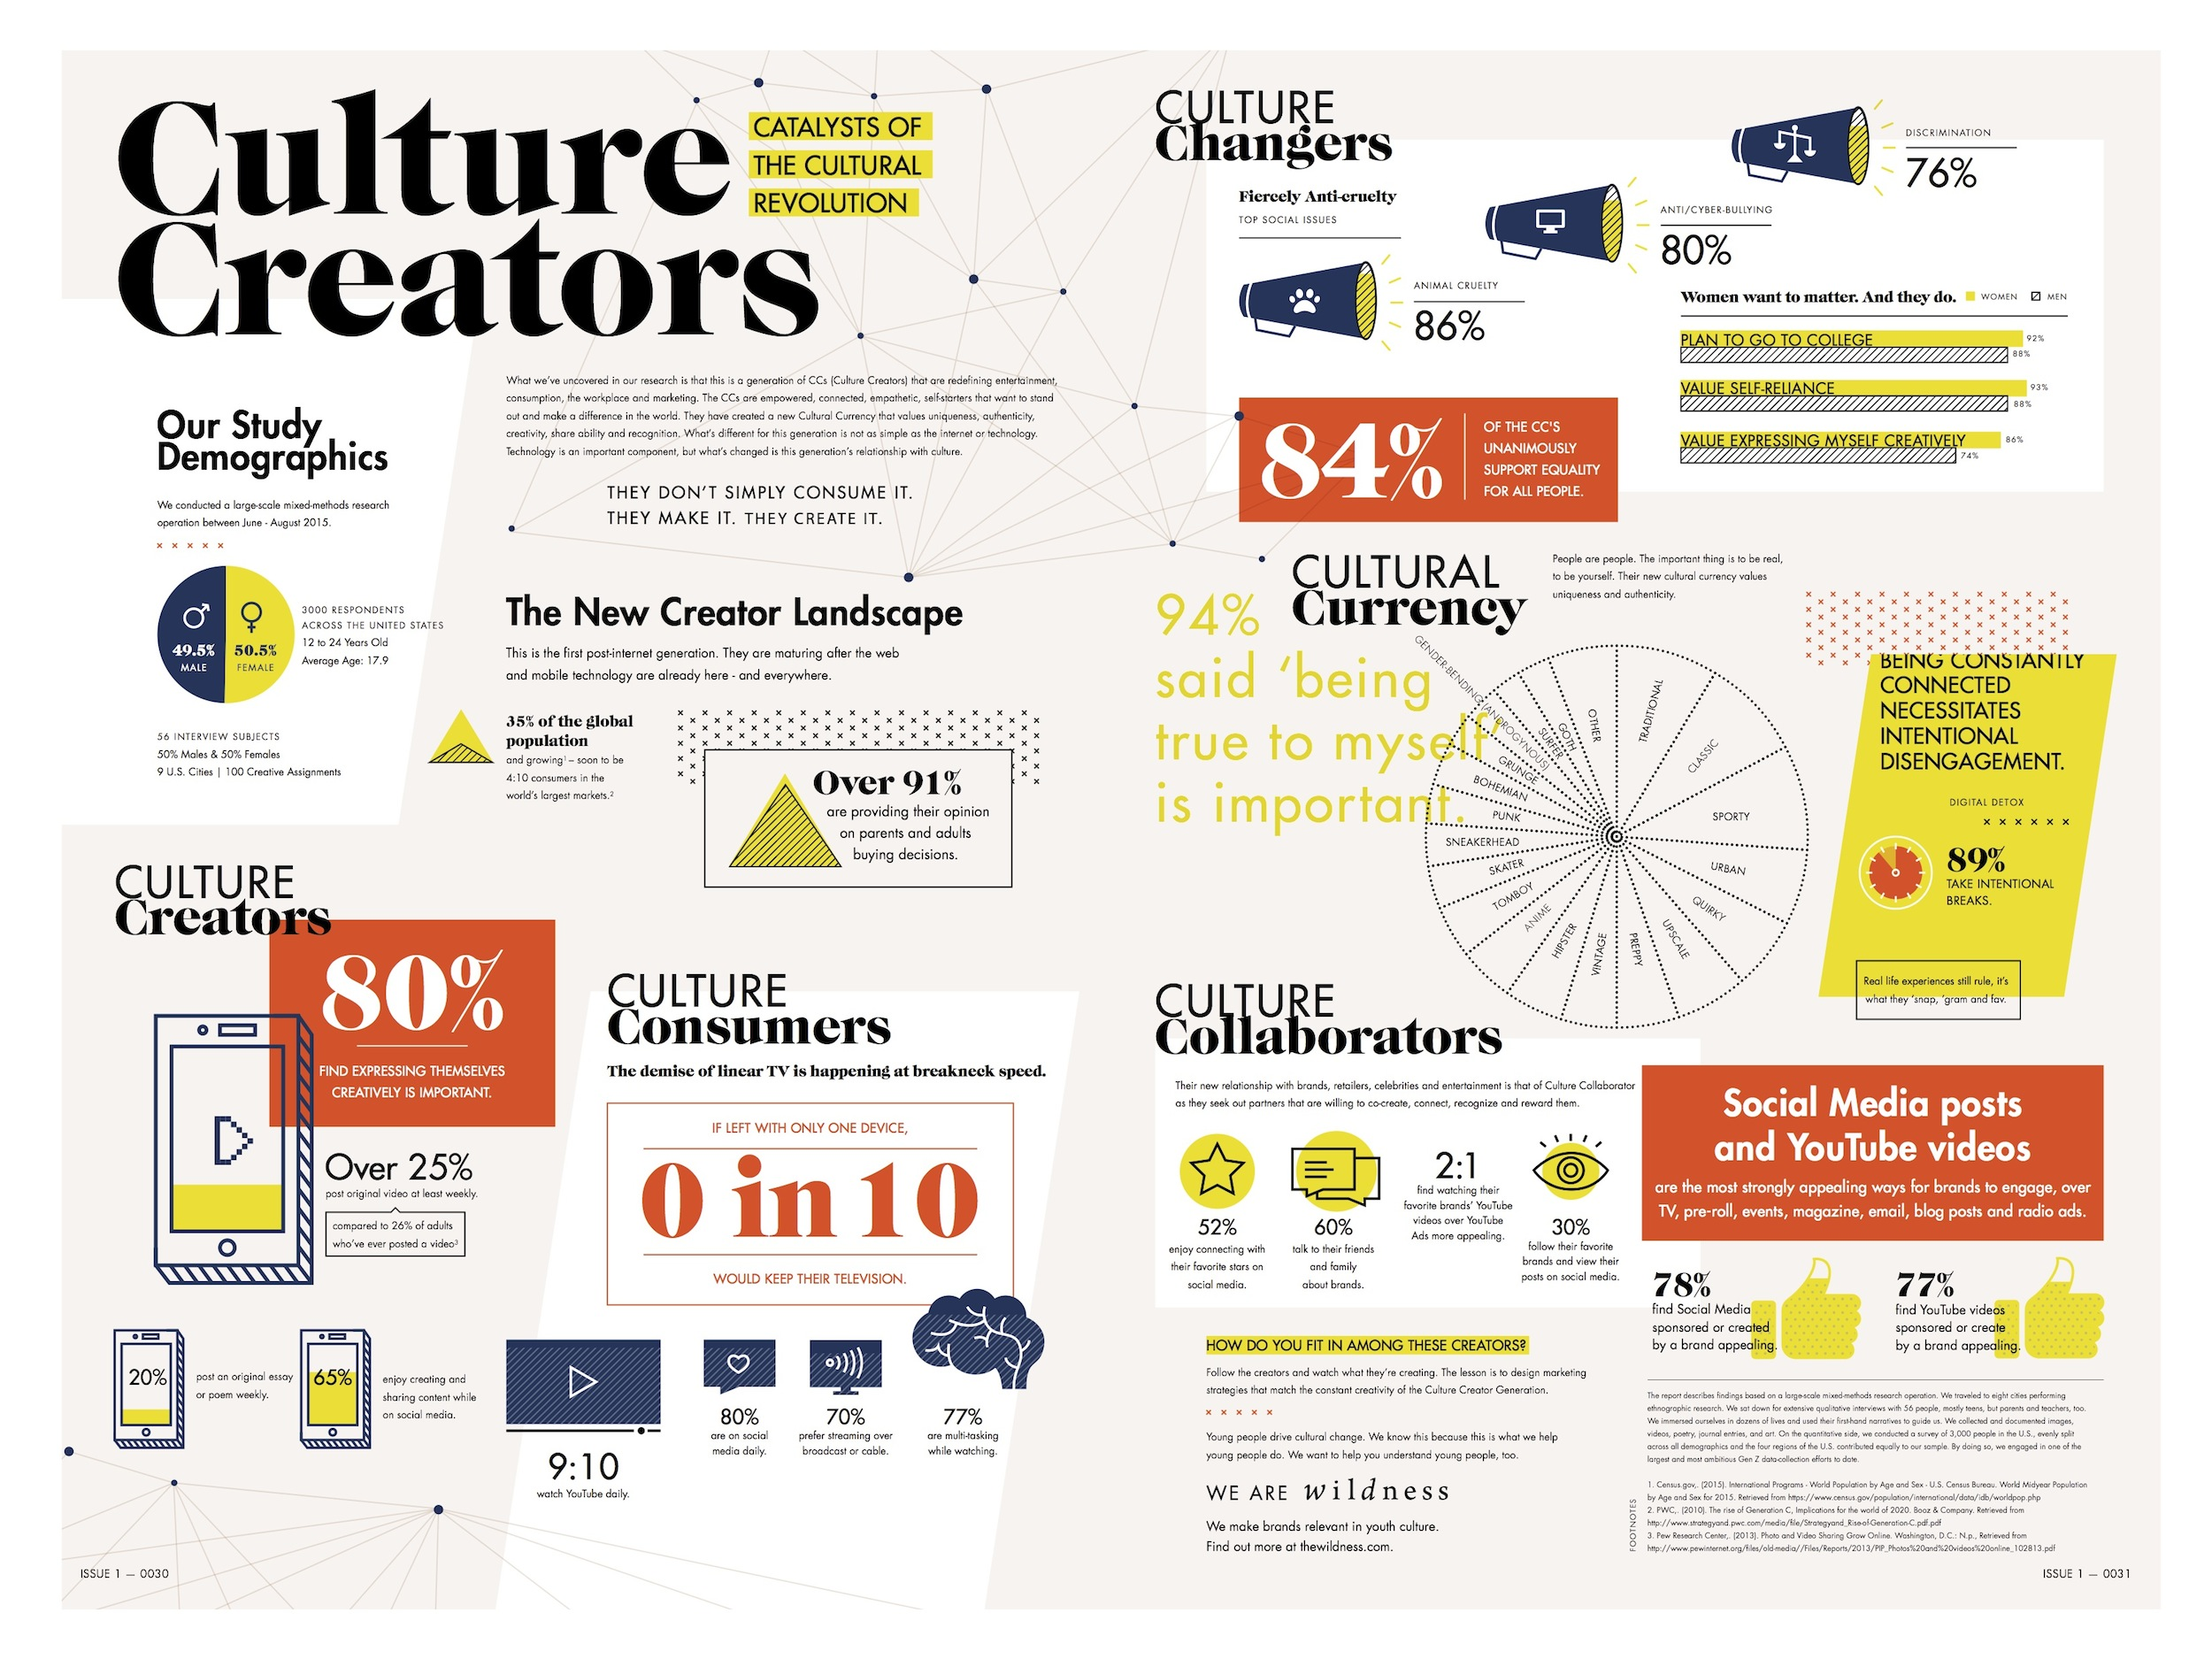 gen z creating new culture